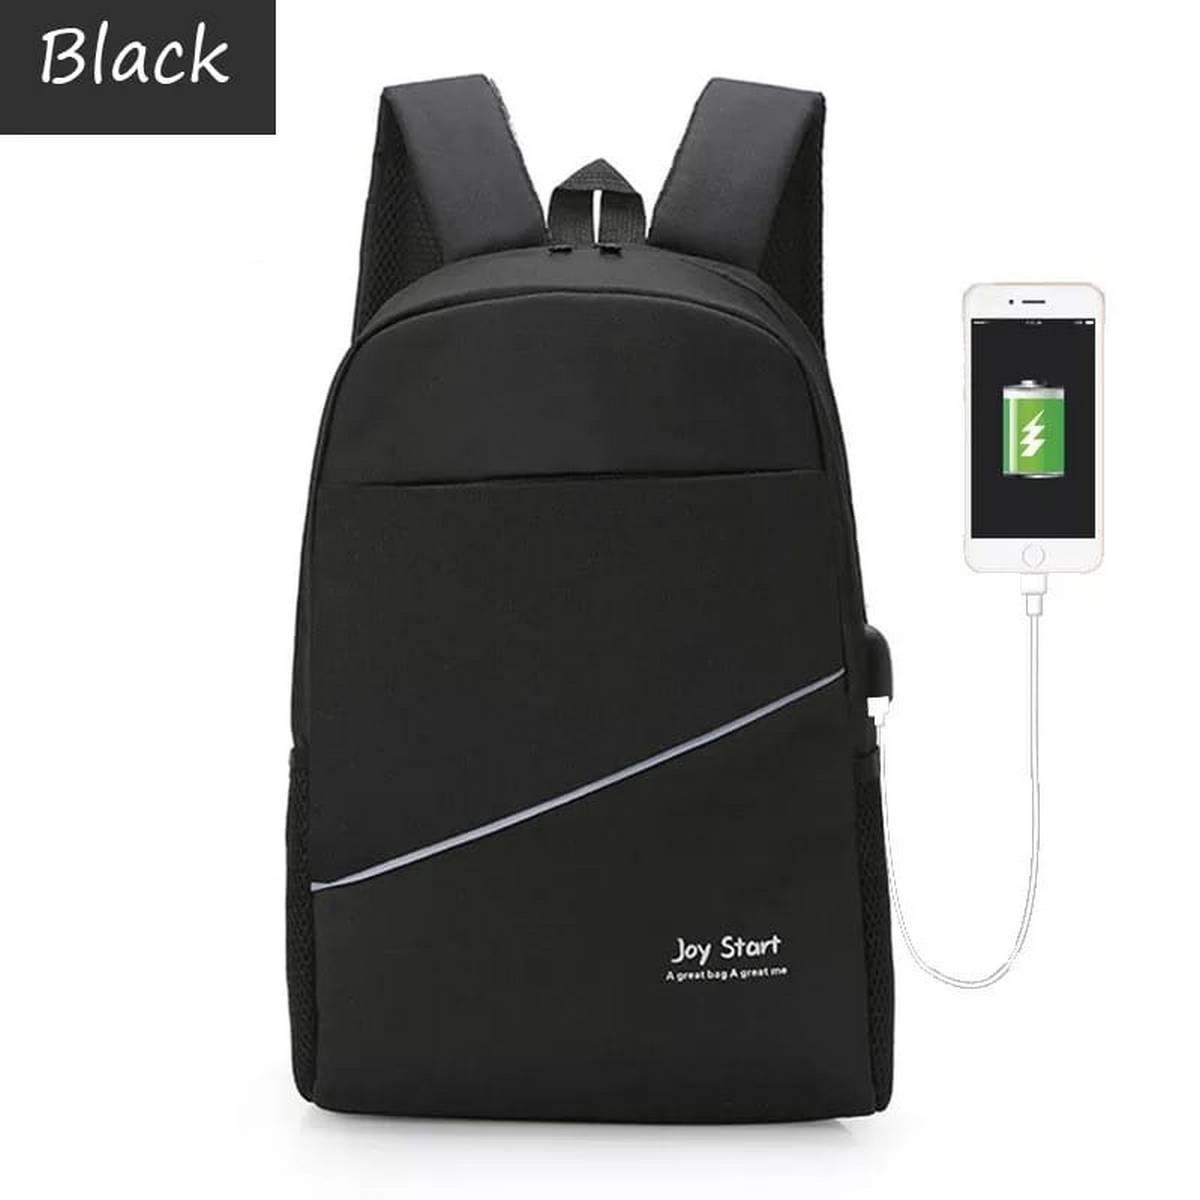 USB Charging New Style Business Backpack, Men Women School Bag, Travel Bag , Sport Bag, Travel Backpack